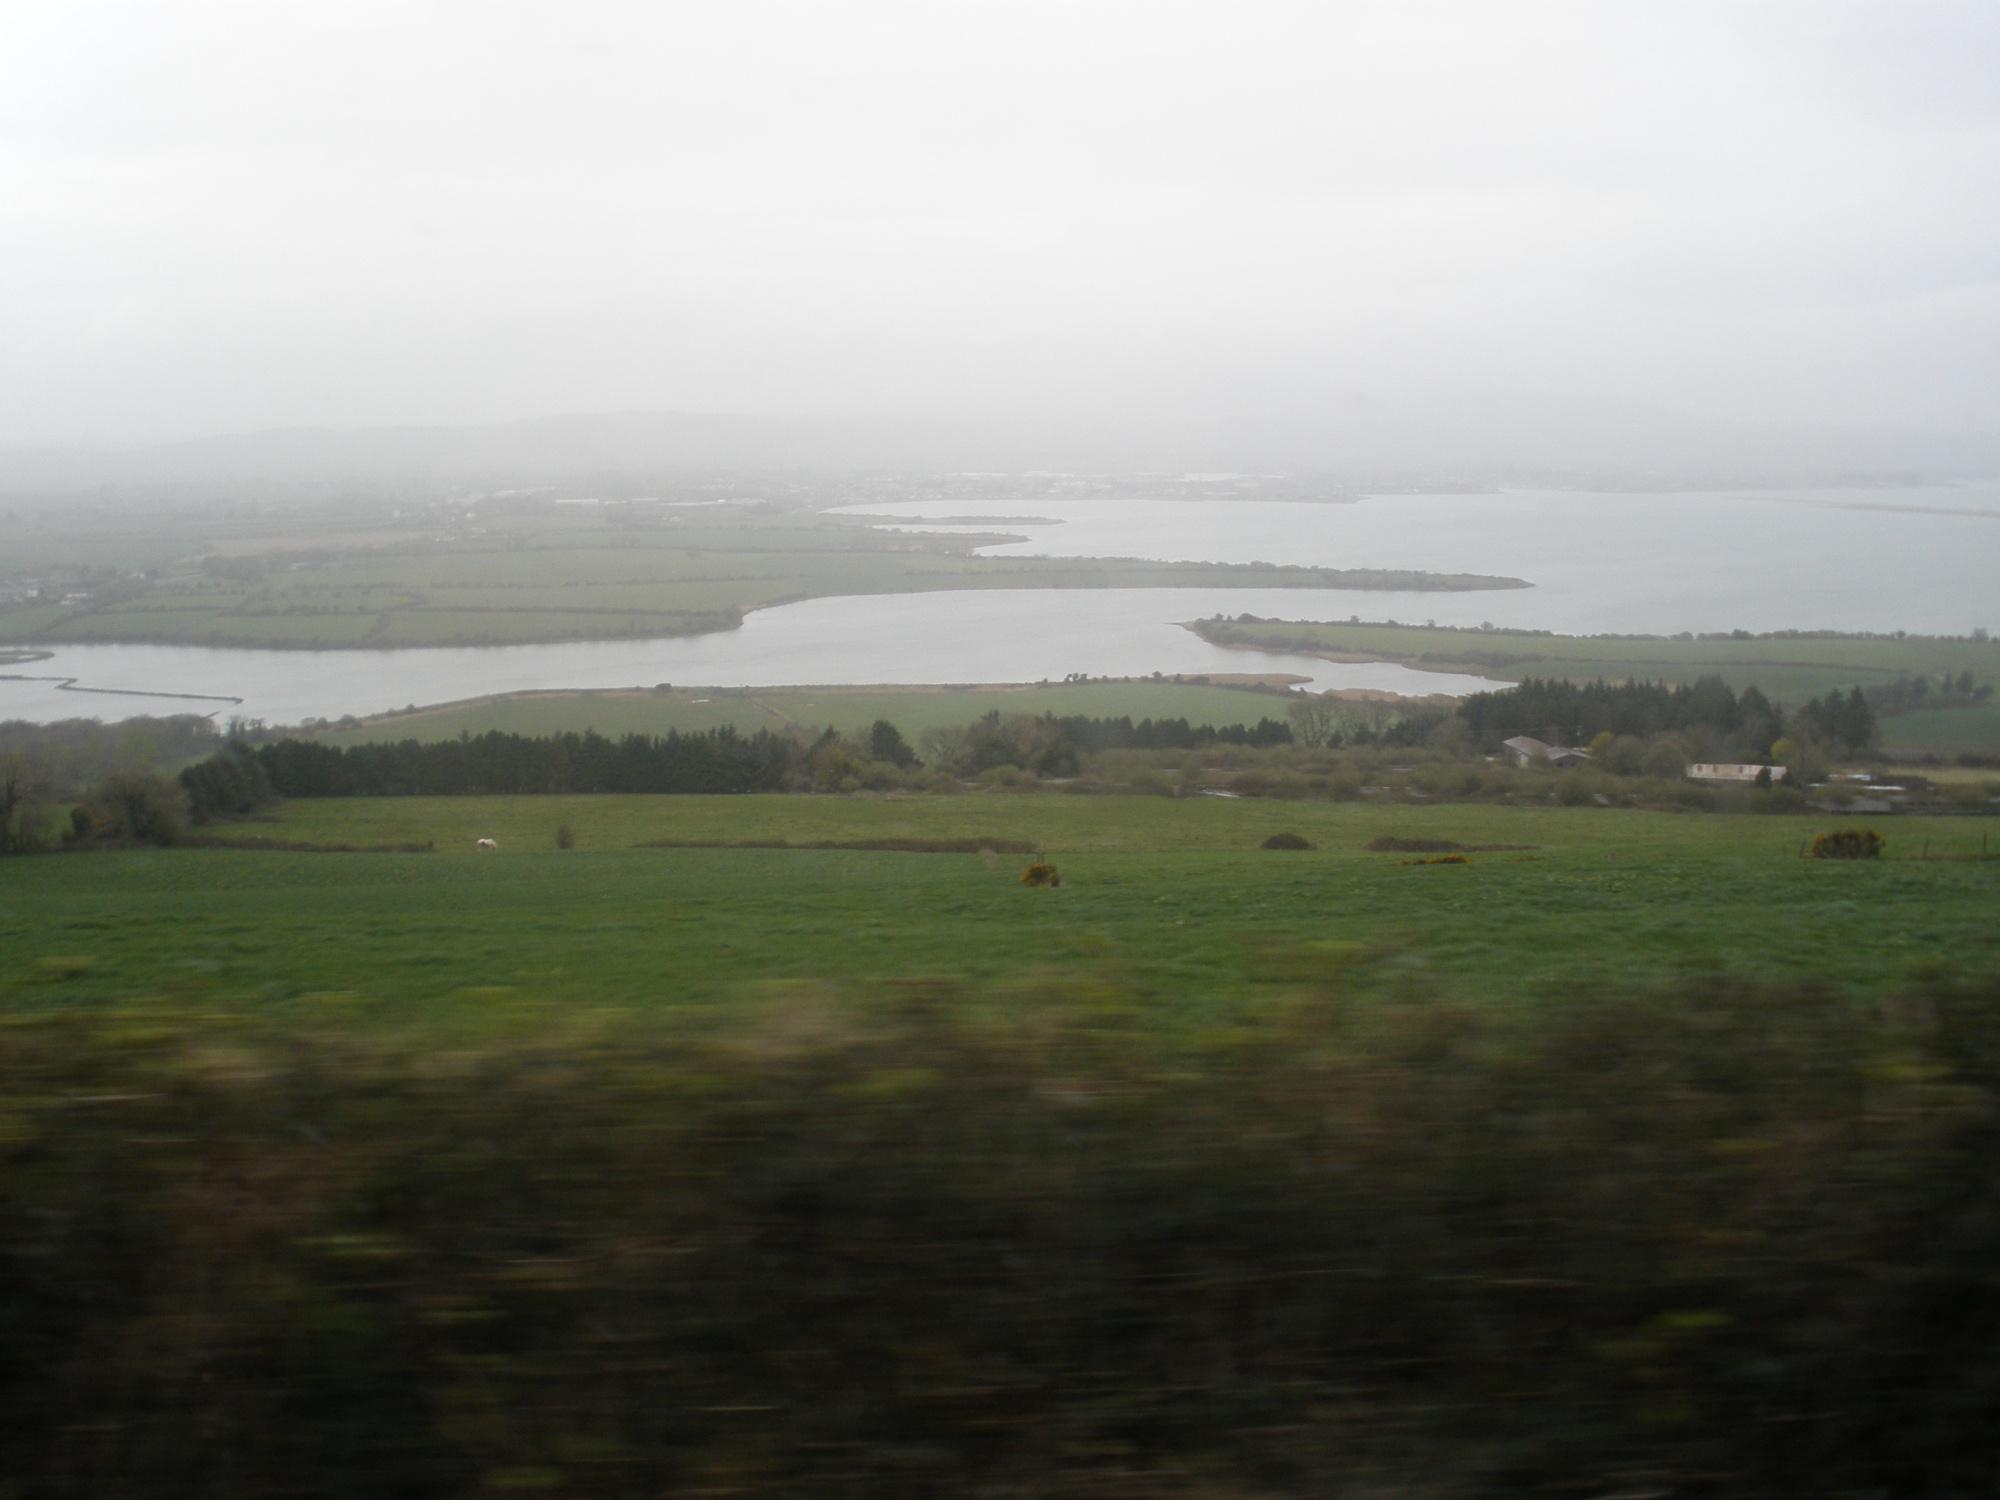 Bus window view